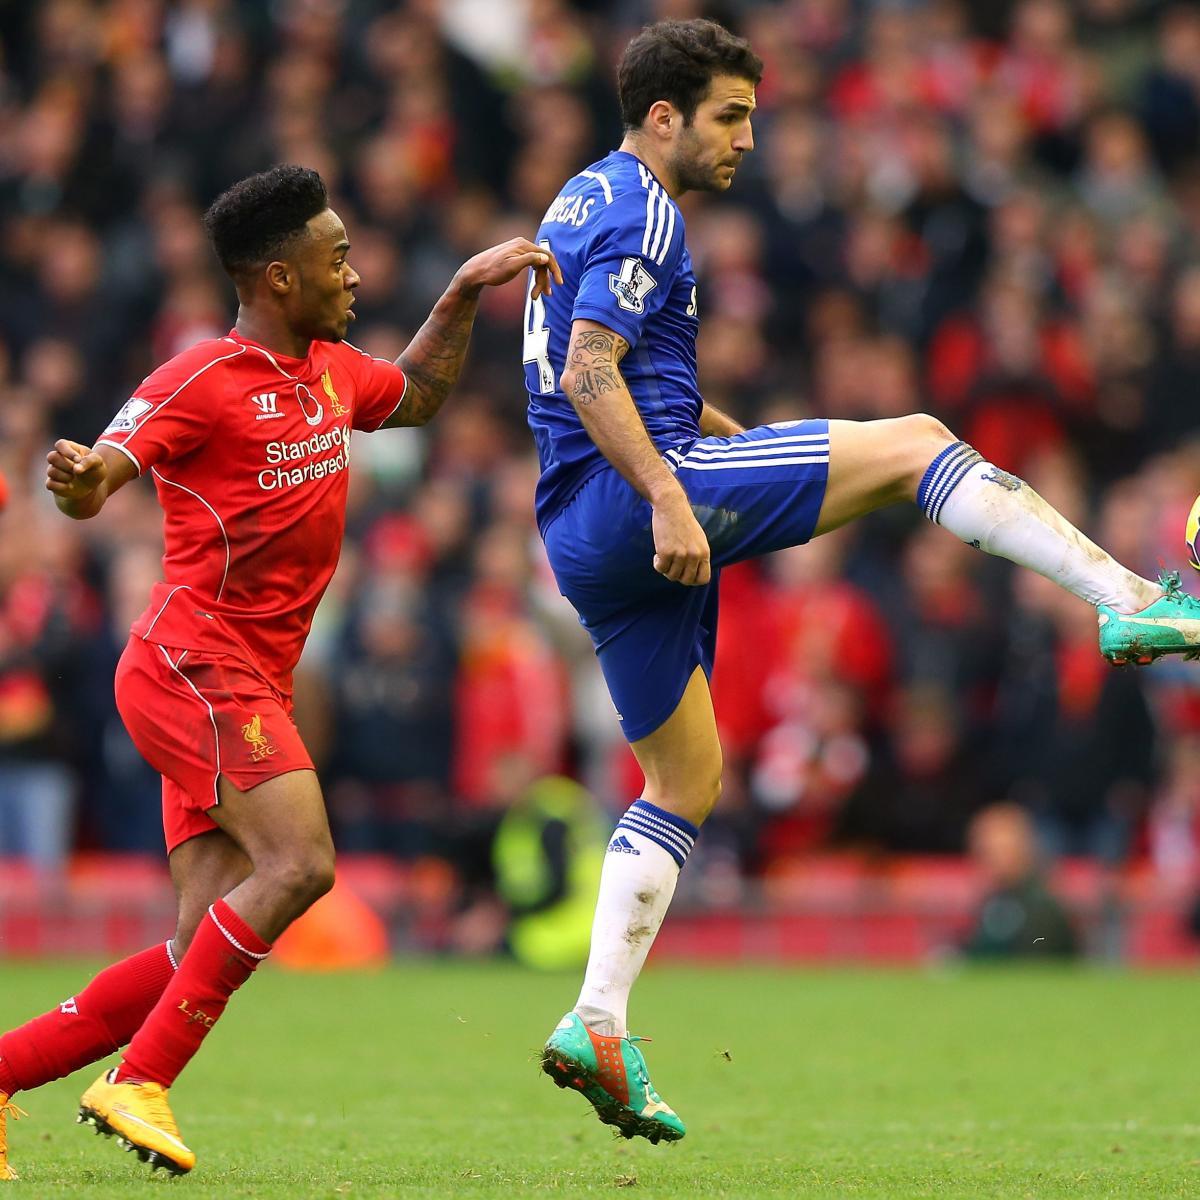 Liverpool Chelsea Live